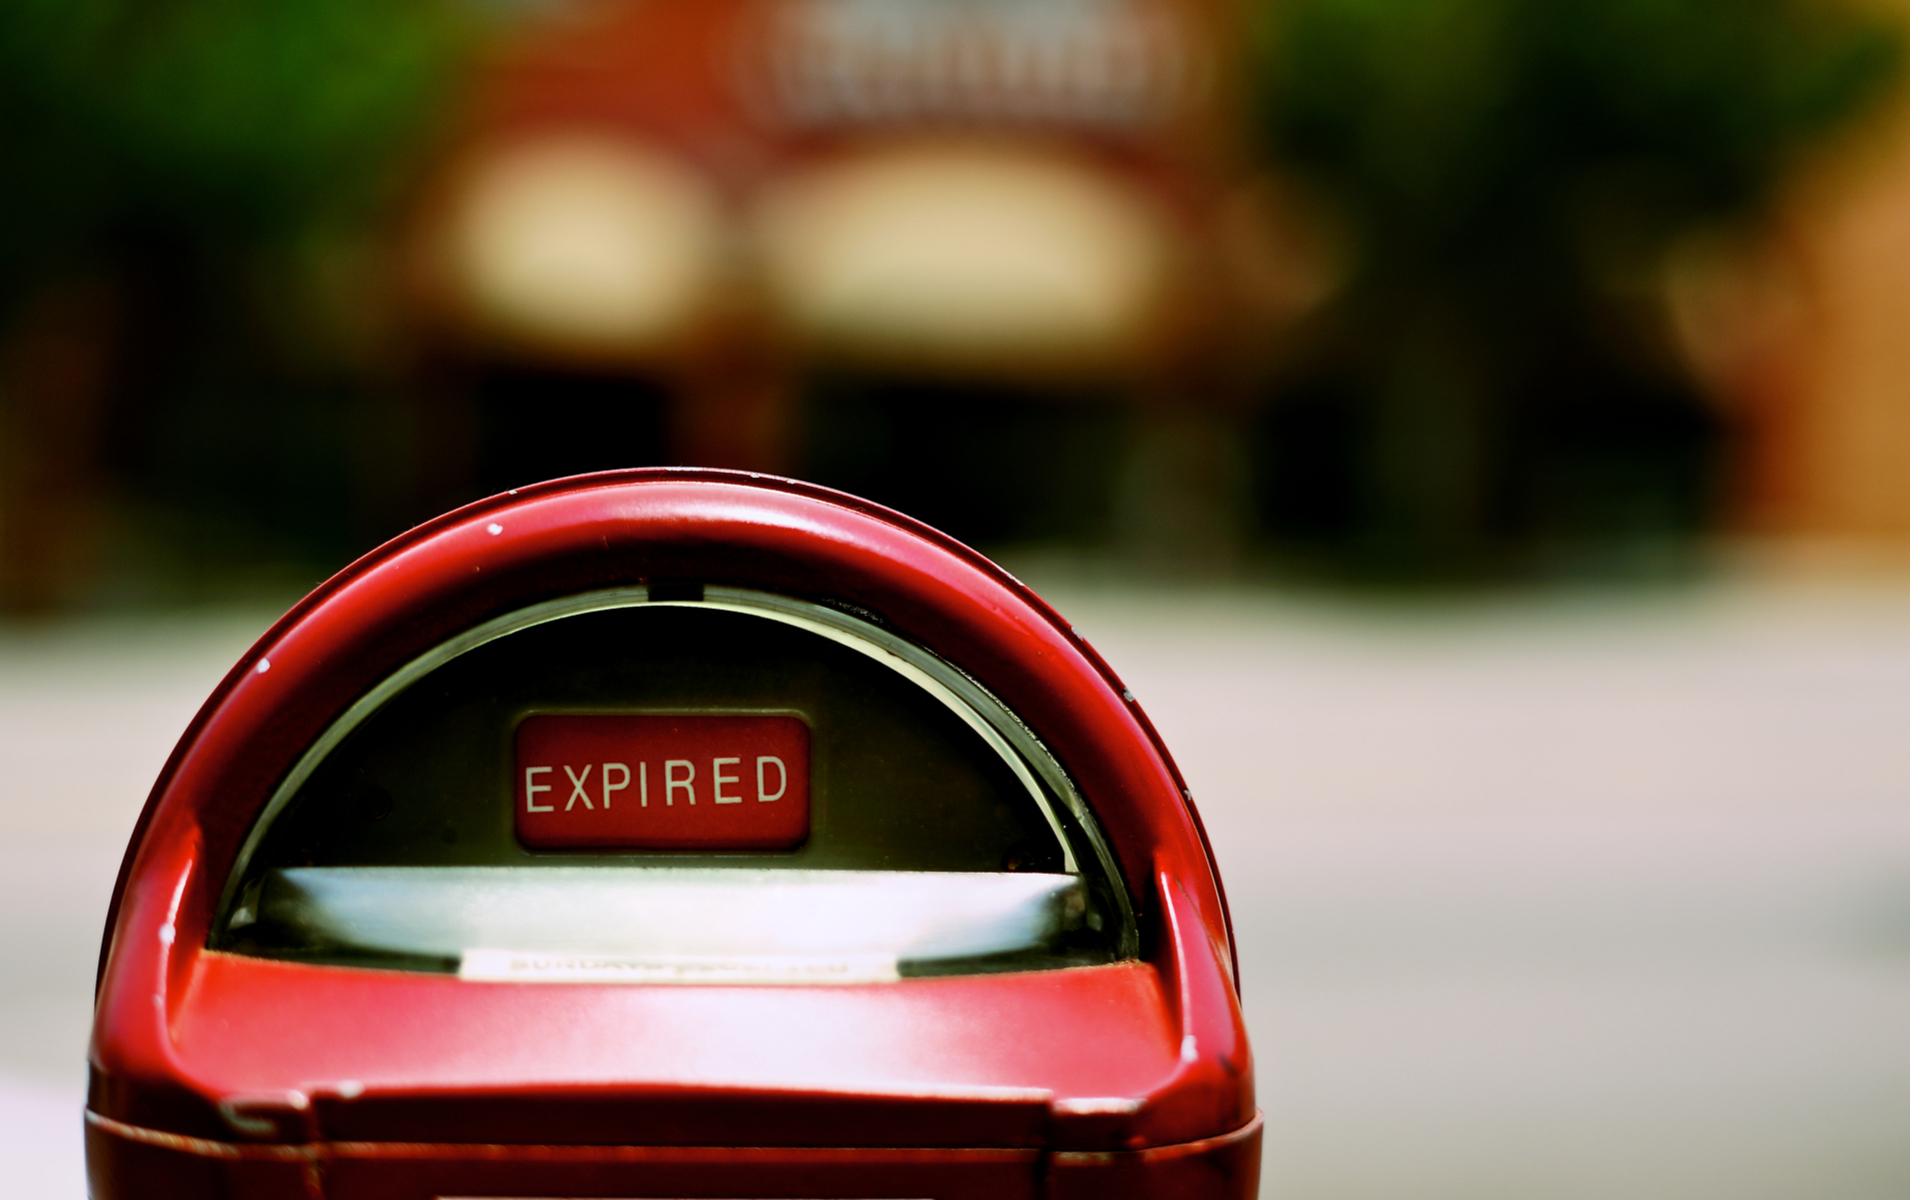 Bitmain IPO Application Fails to Impress – Set to Expire Today